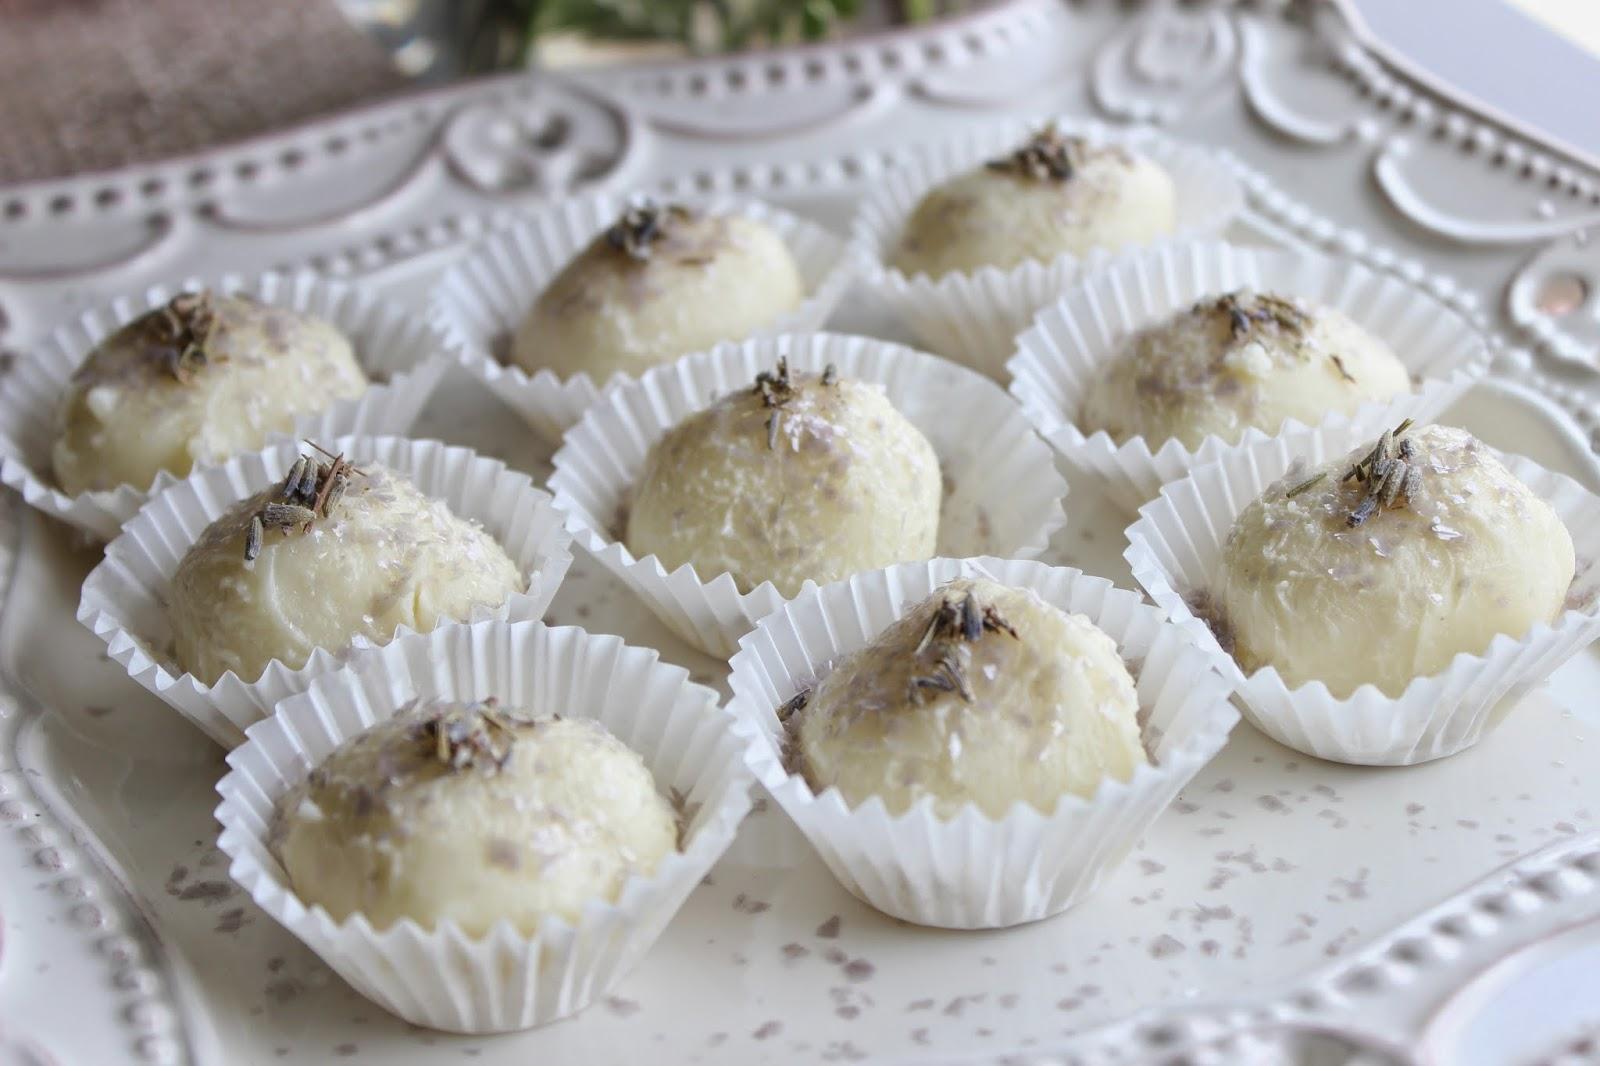 lemon lavender white chocolate truffle